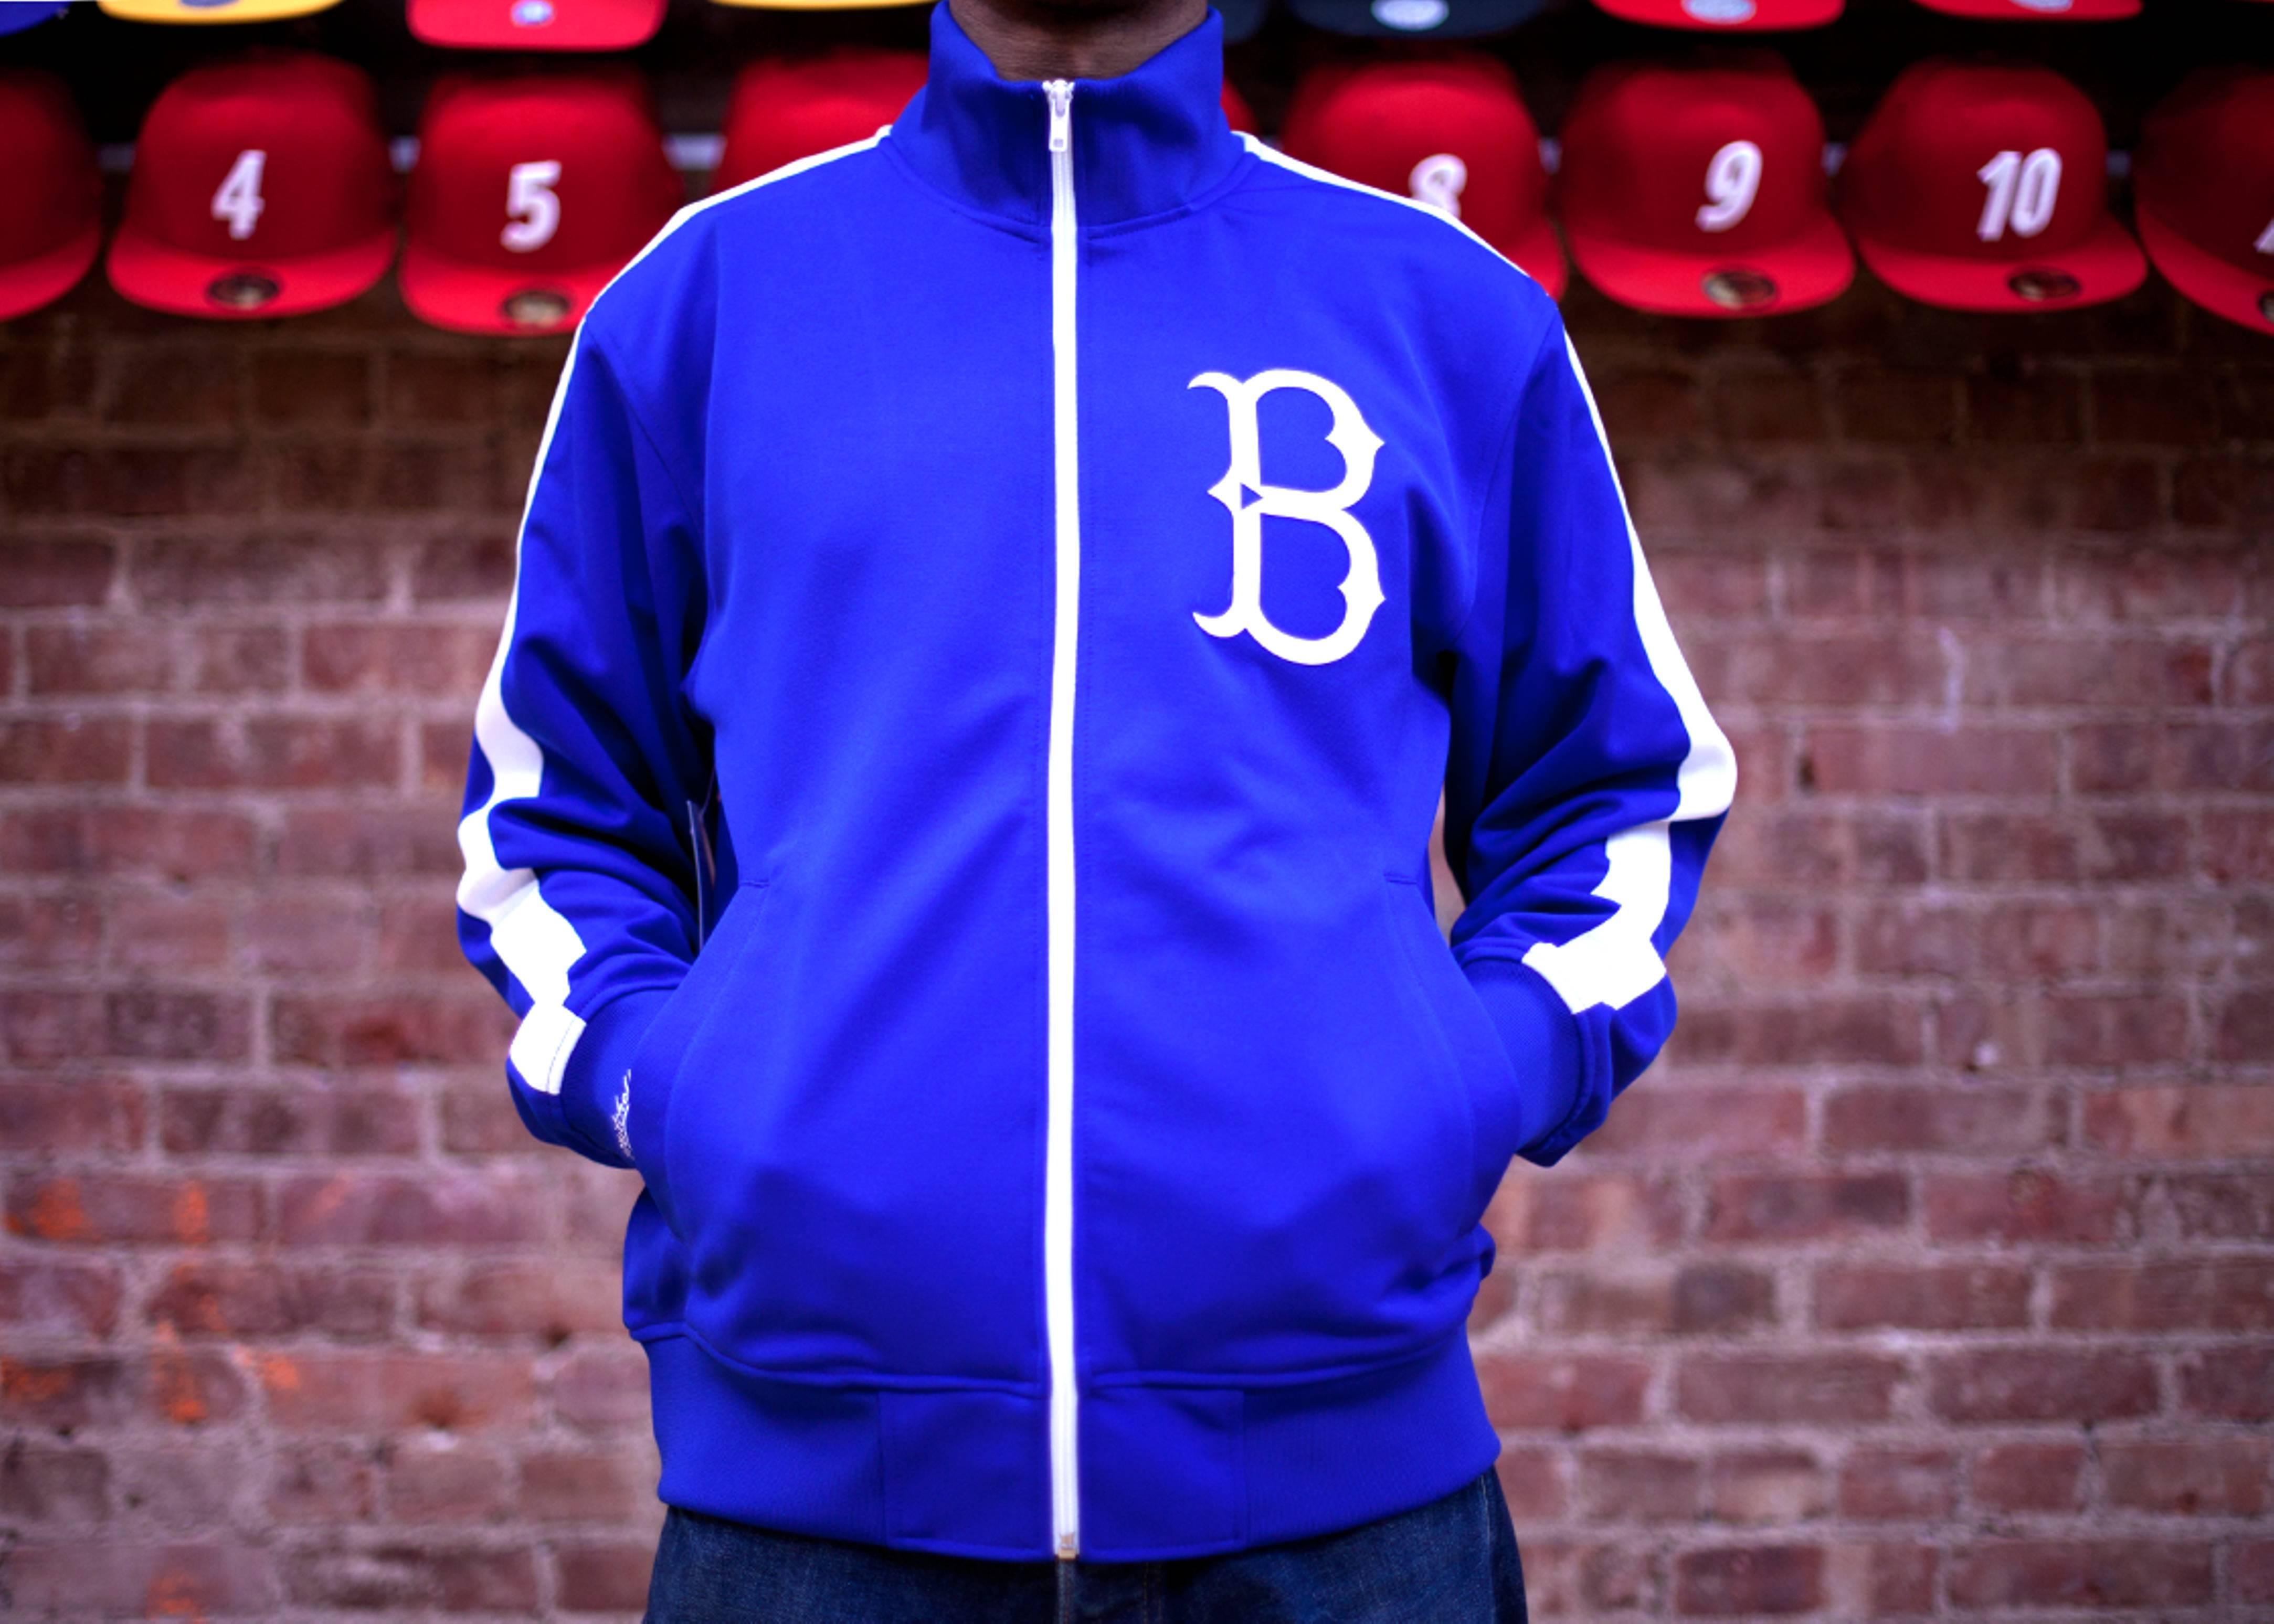 brooklyn dodgers pinch hitter track jacket